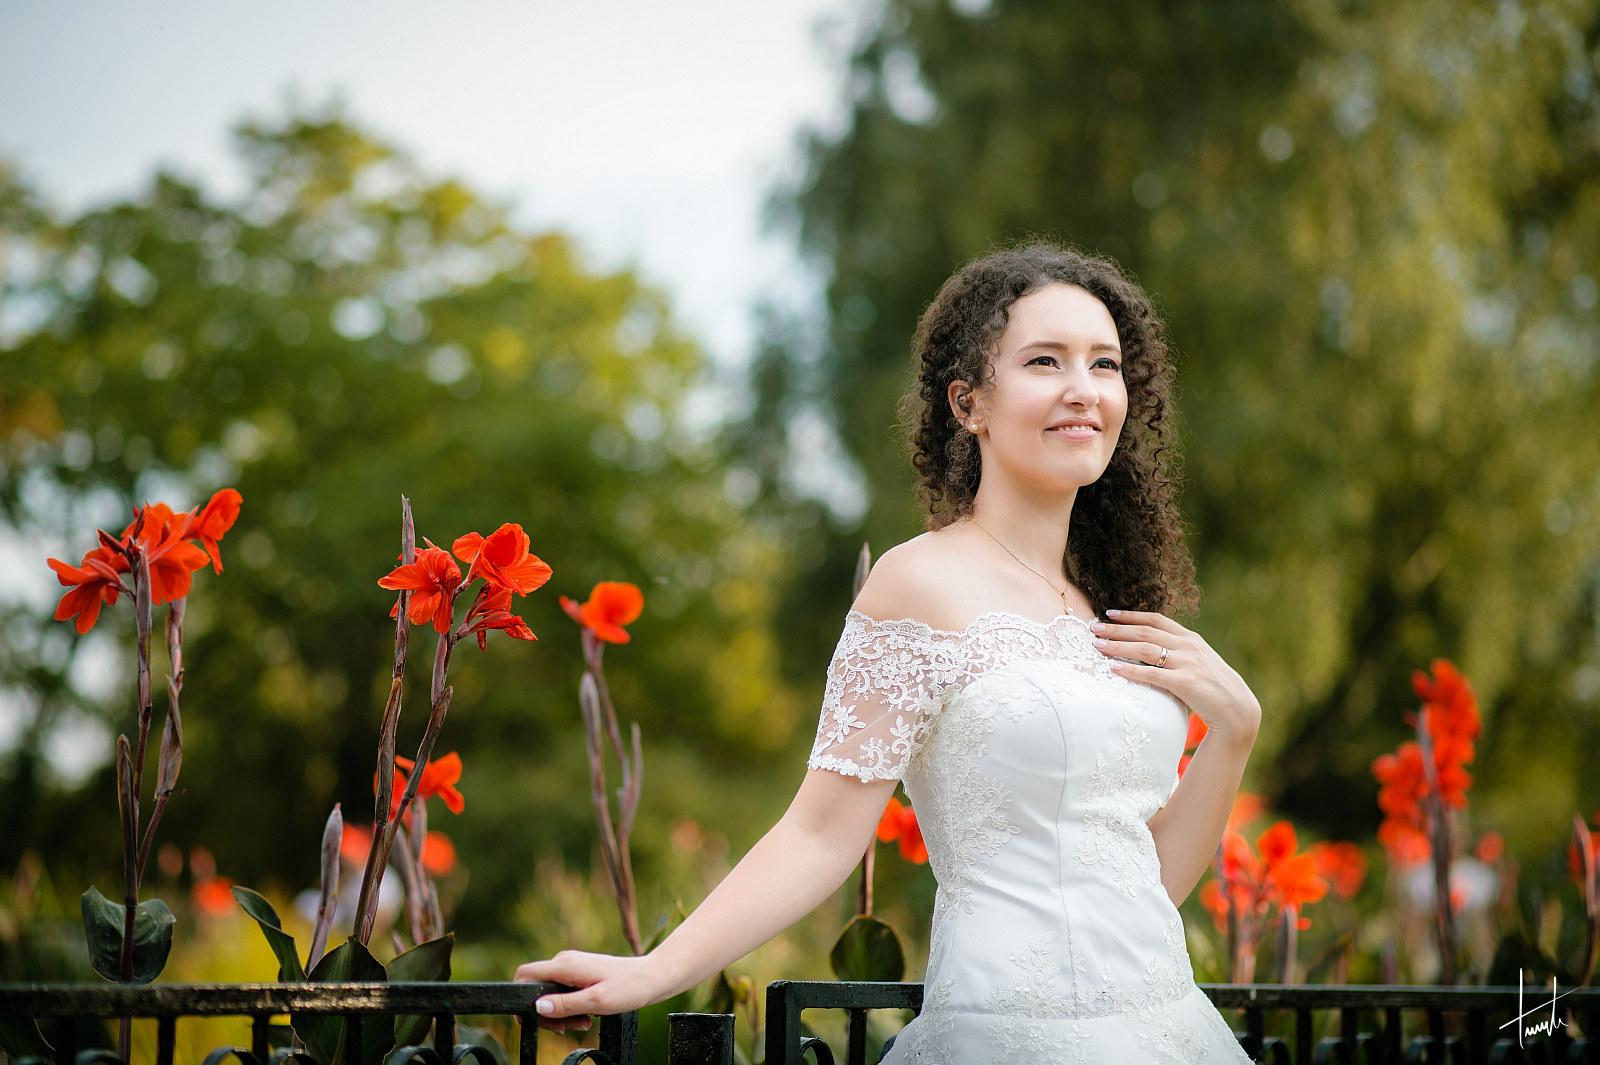 fotografie de nunta - Martha Ionut 13